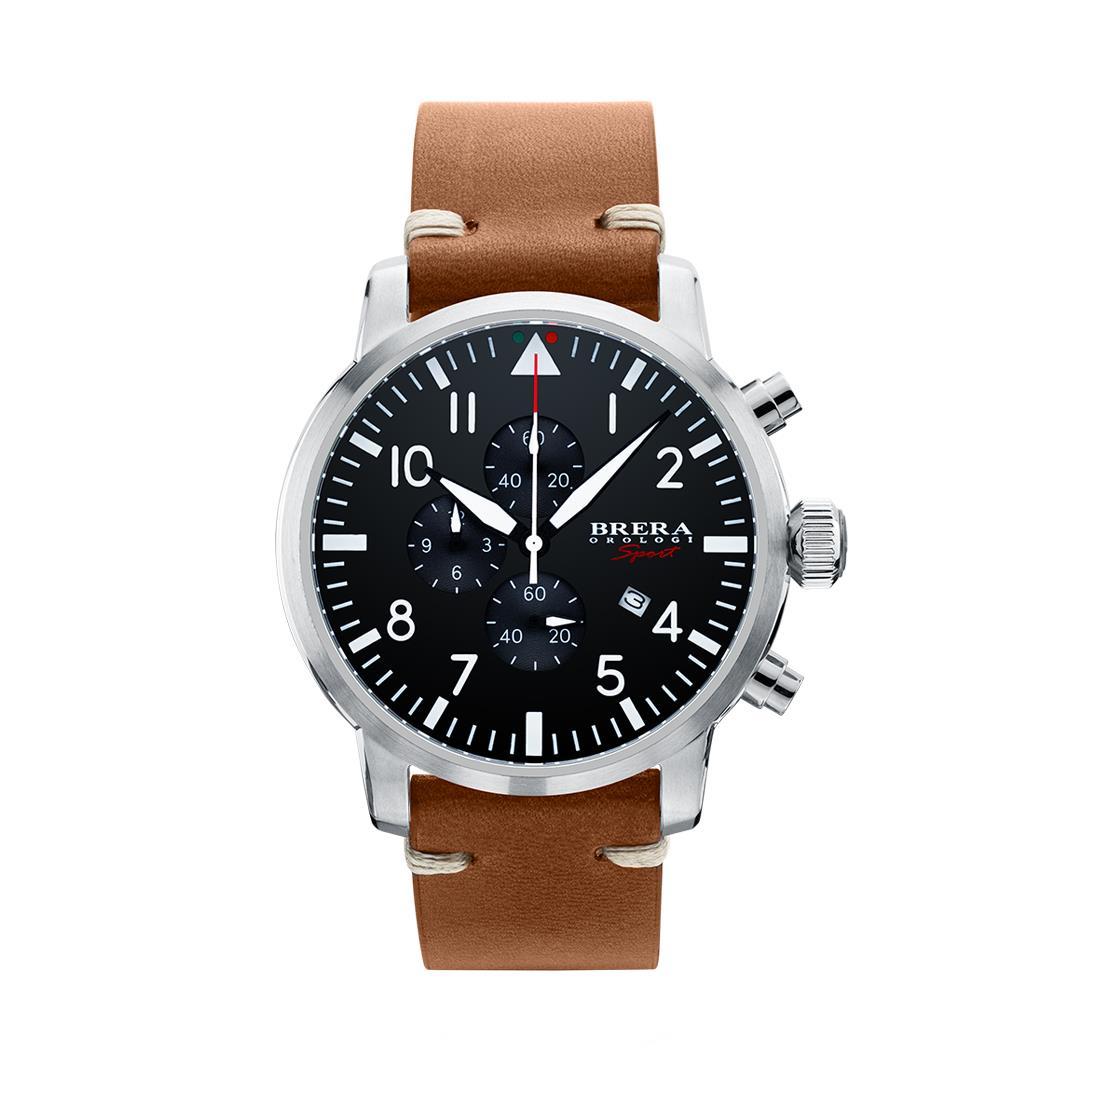 Men's watch 44mm case - BRERA OROLOGI